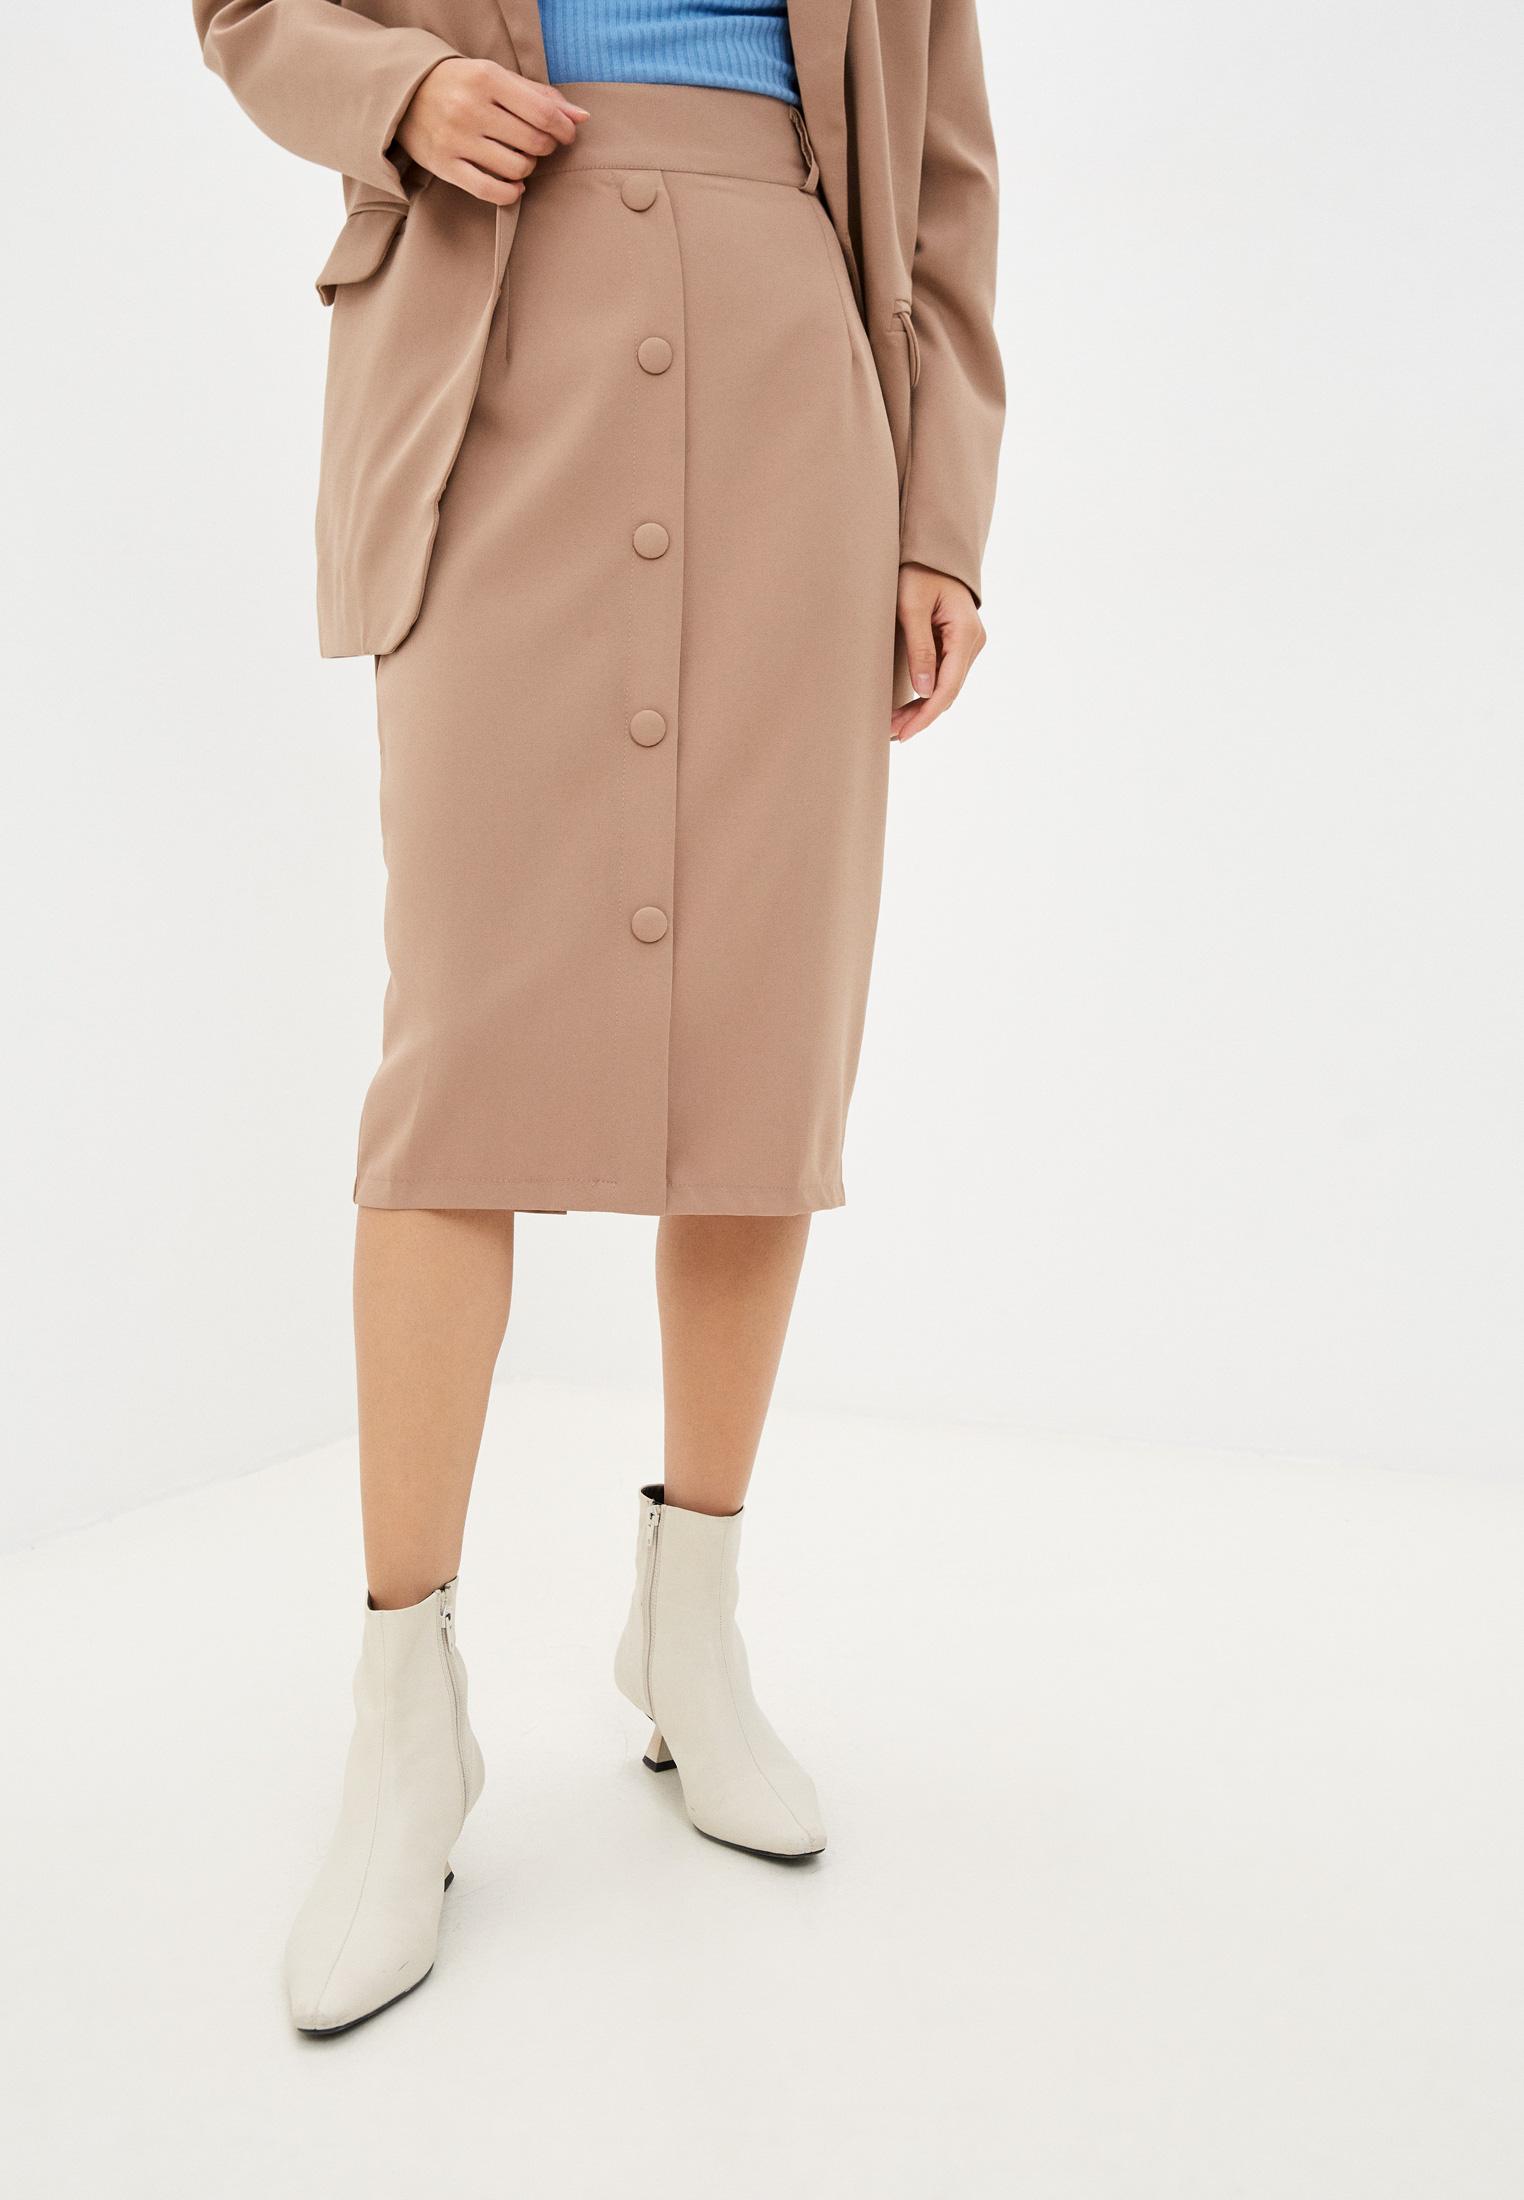 Узкая юбка Diverius d0971